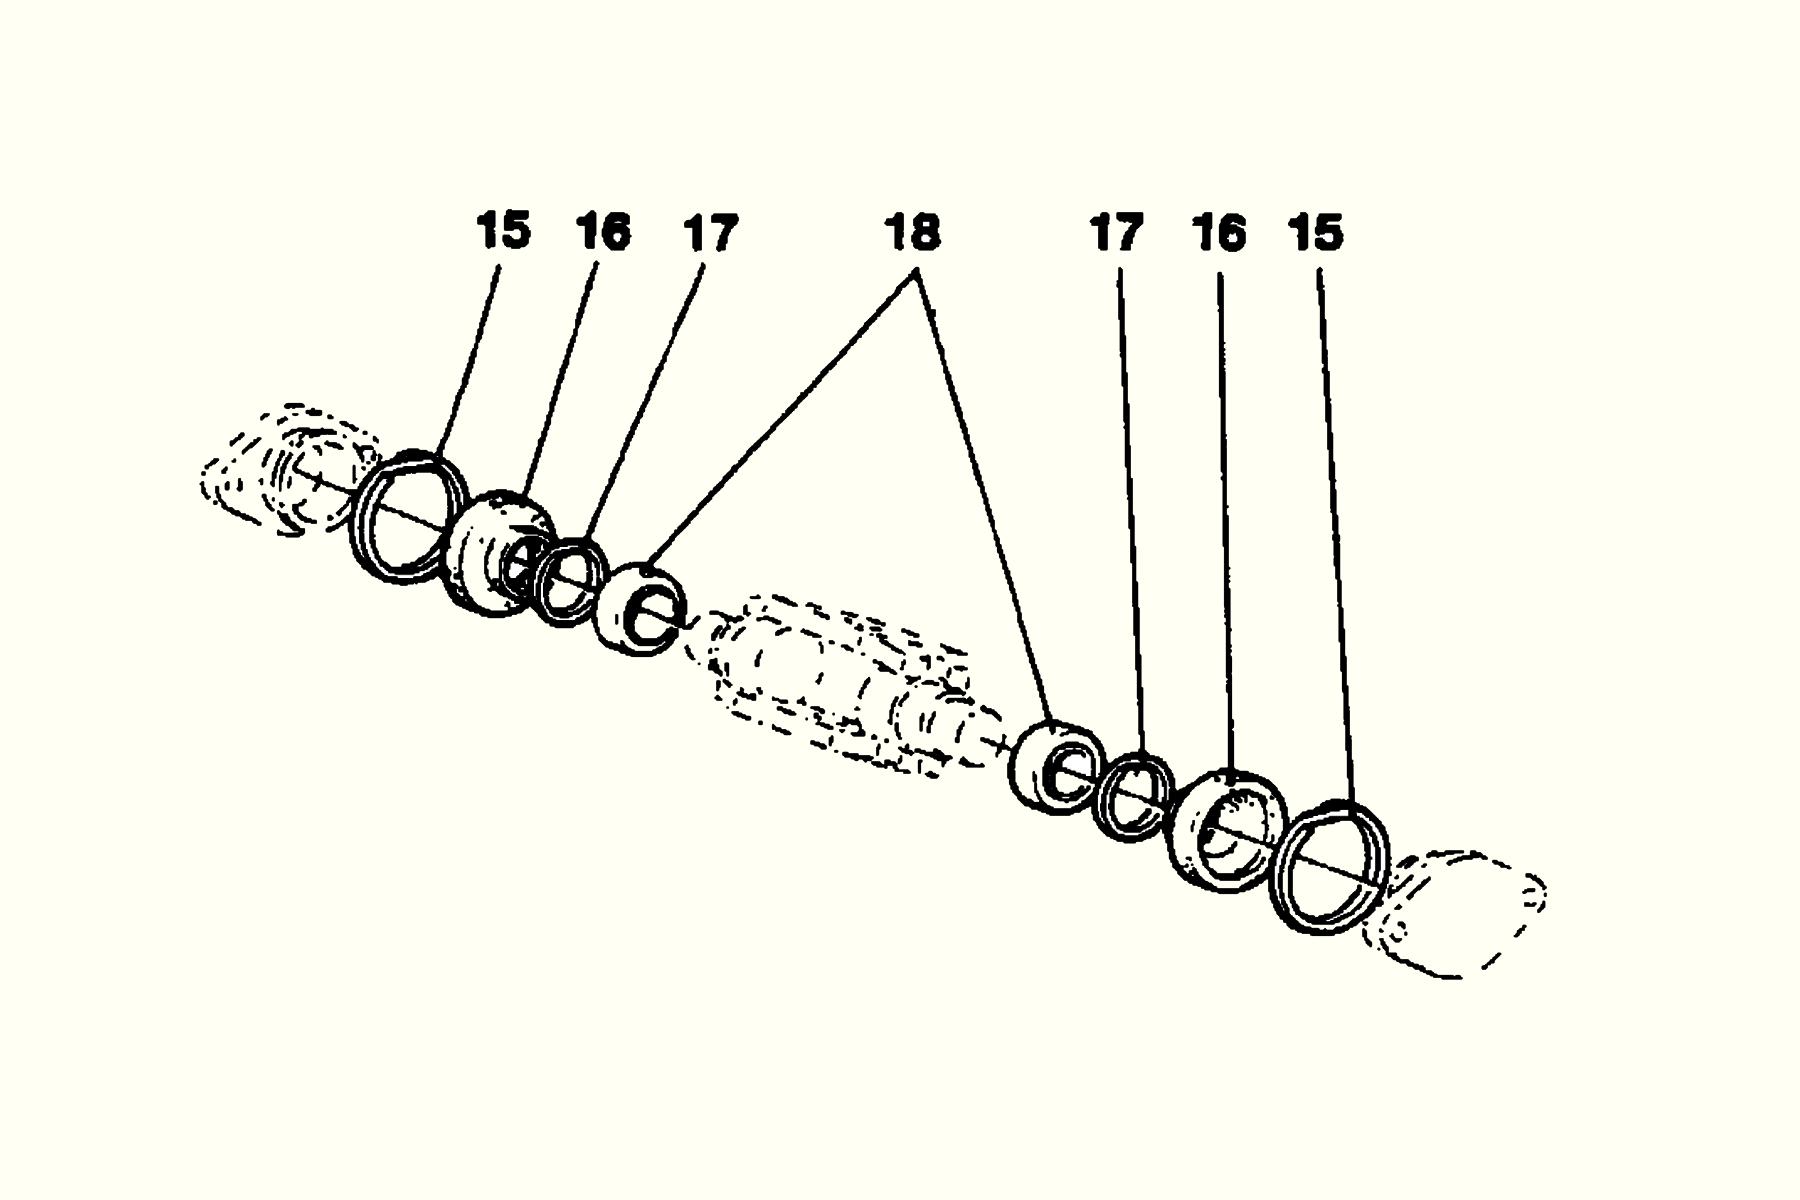 Dampin and tilt cylinder back mount Repair kit häggor Nr: 153 6174-805 Price: 1040 SEK